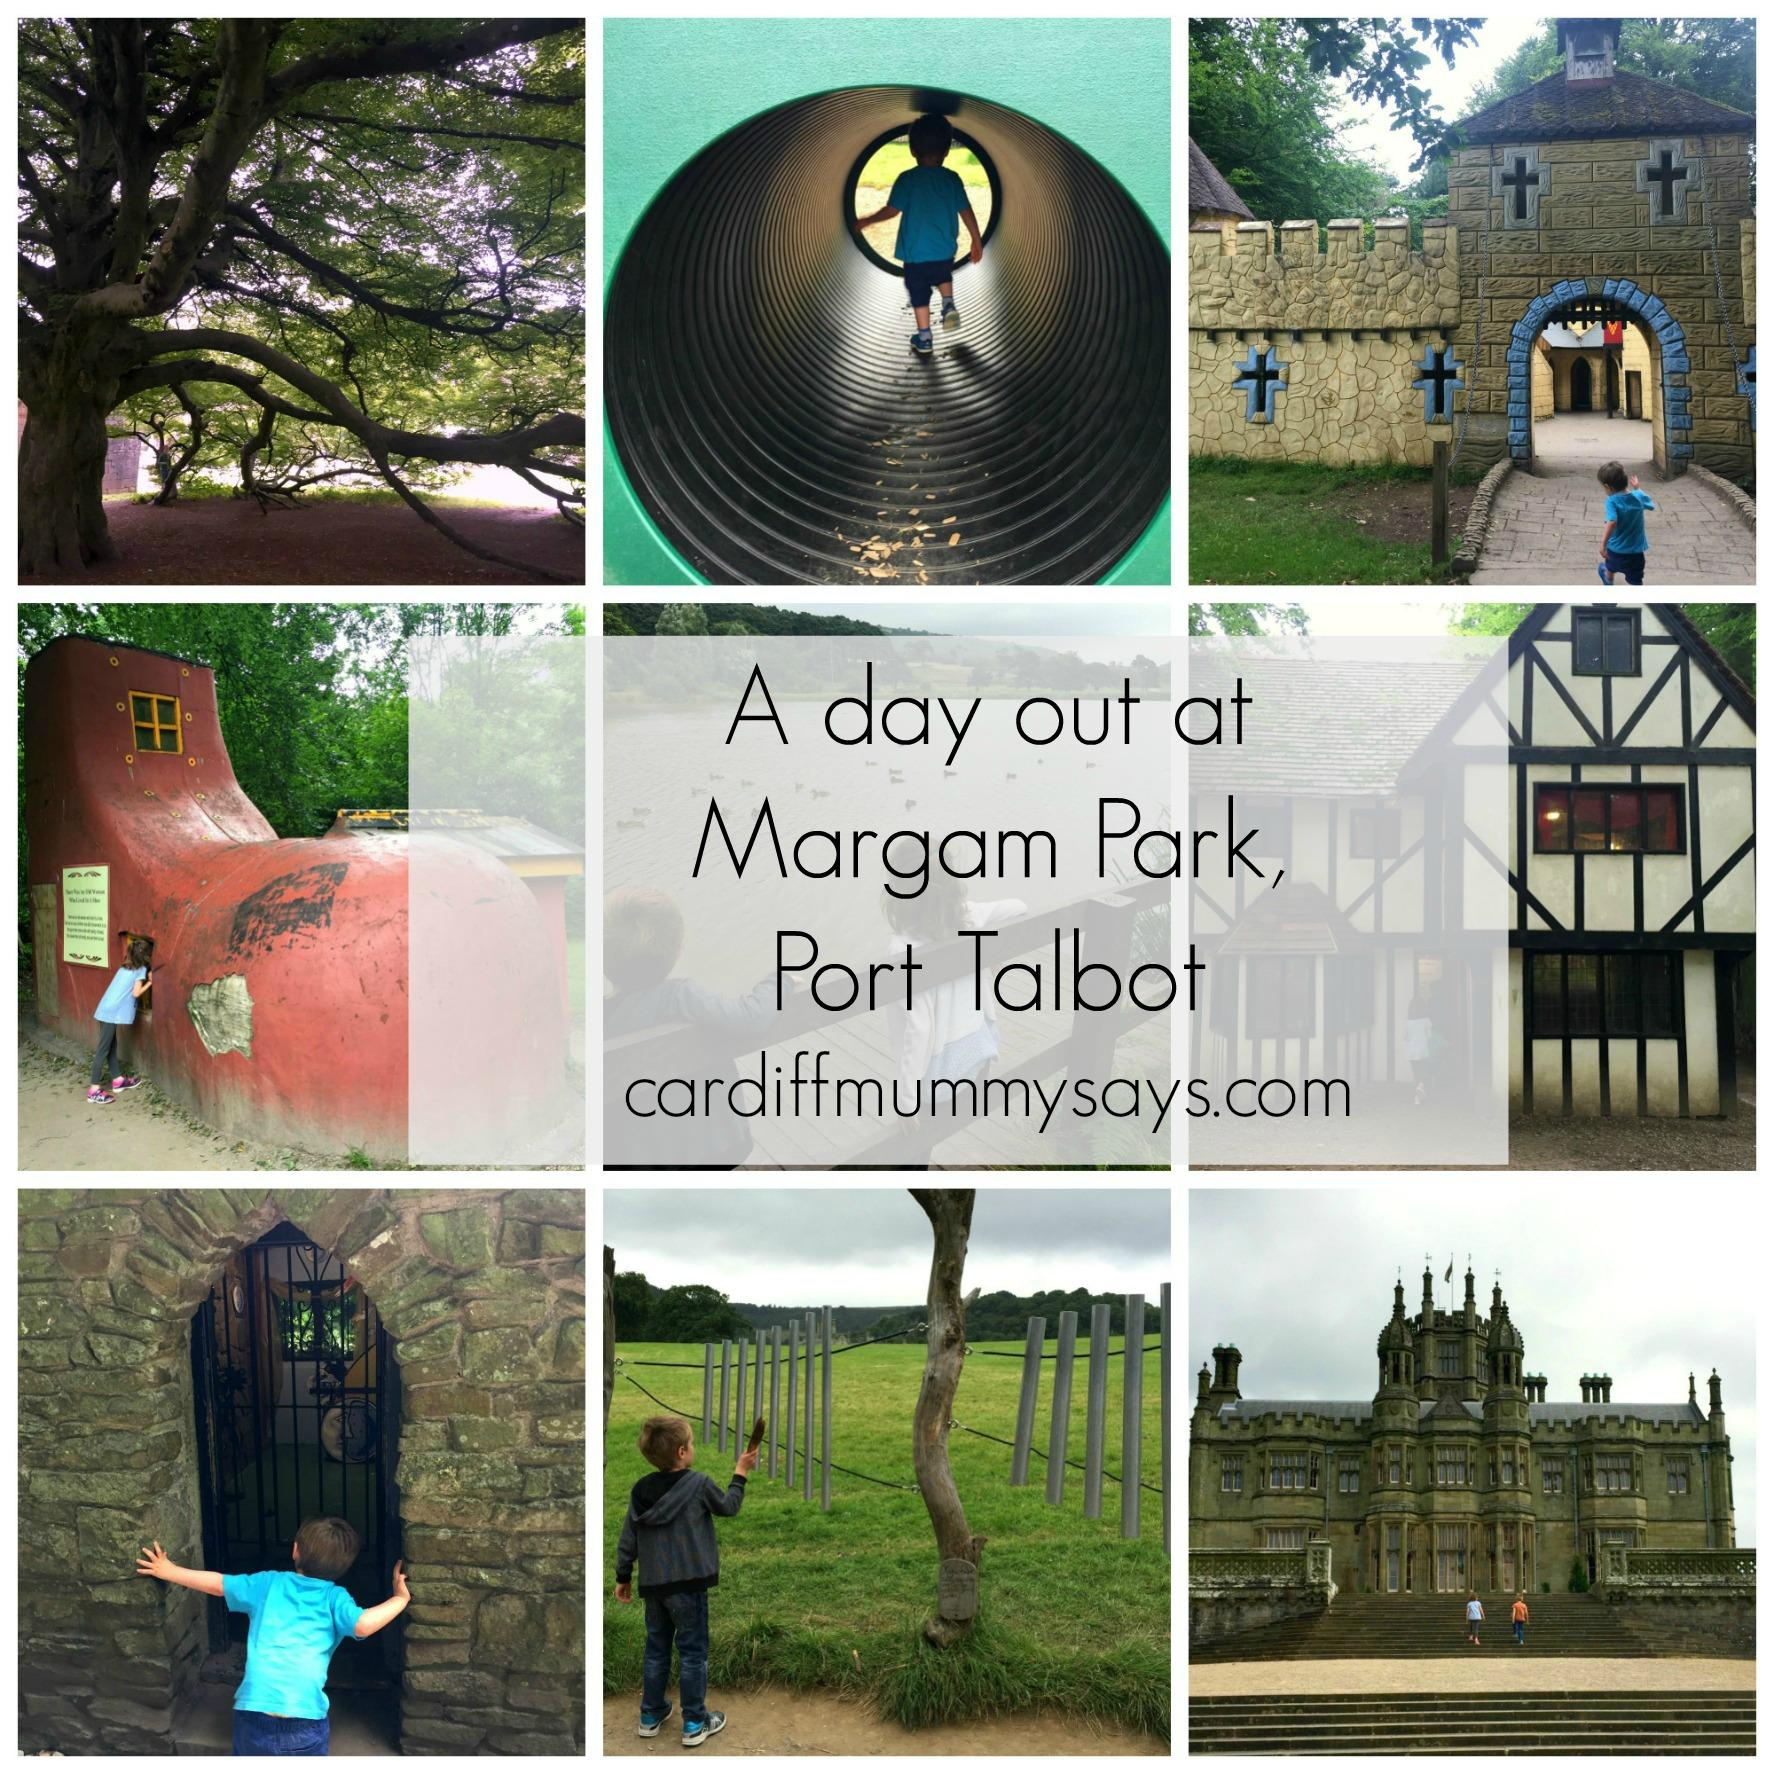 Margam Park